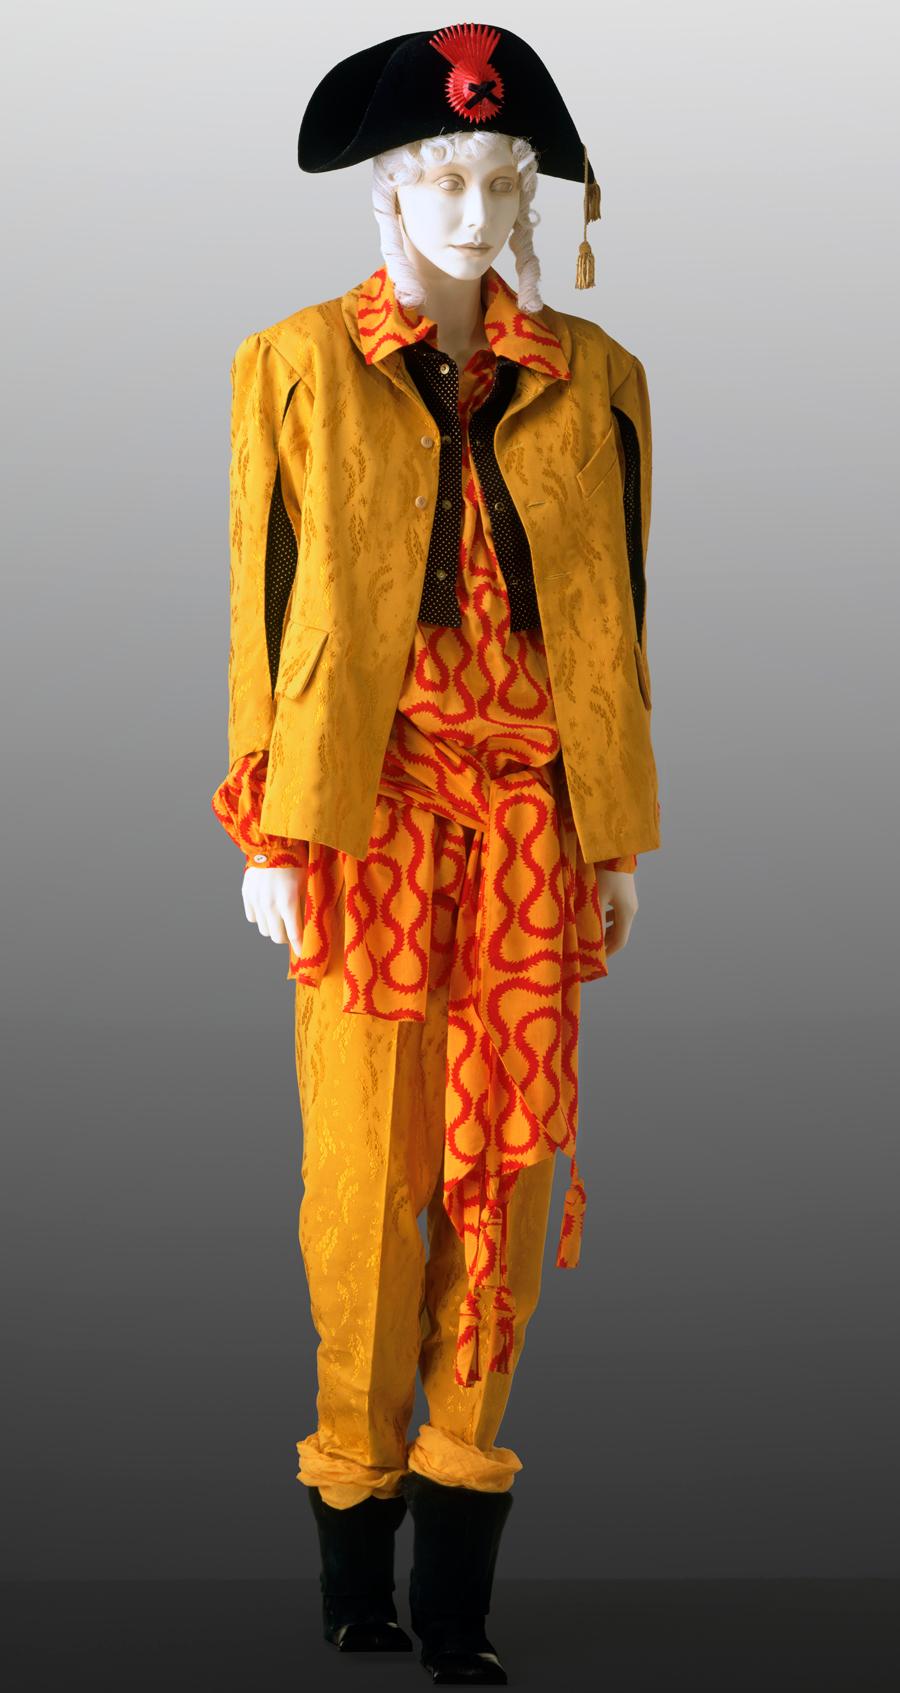 cheap 1950s dresses uk